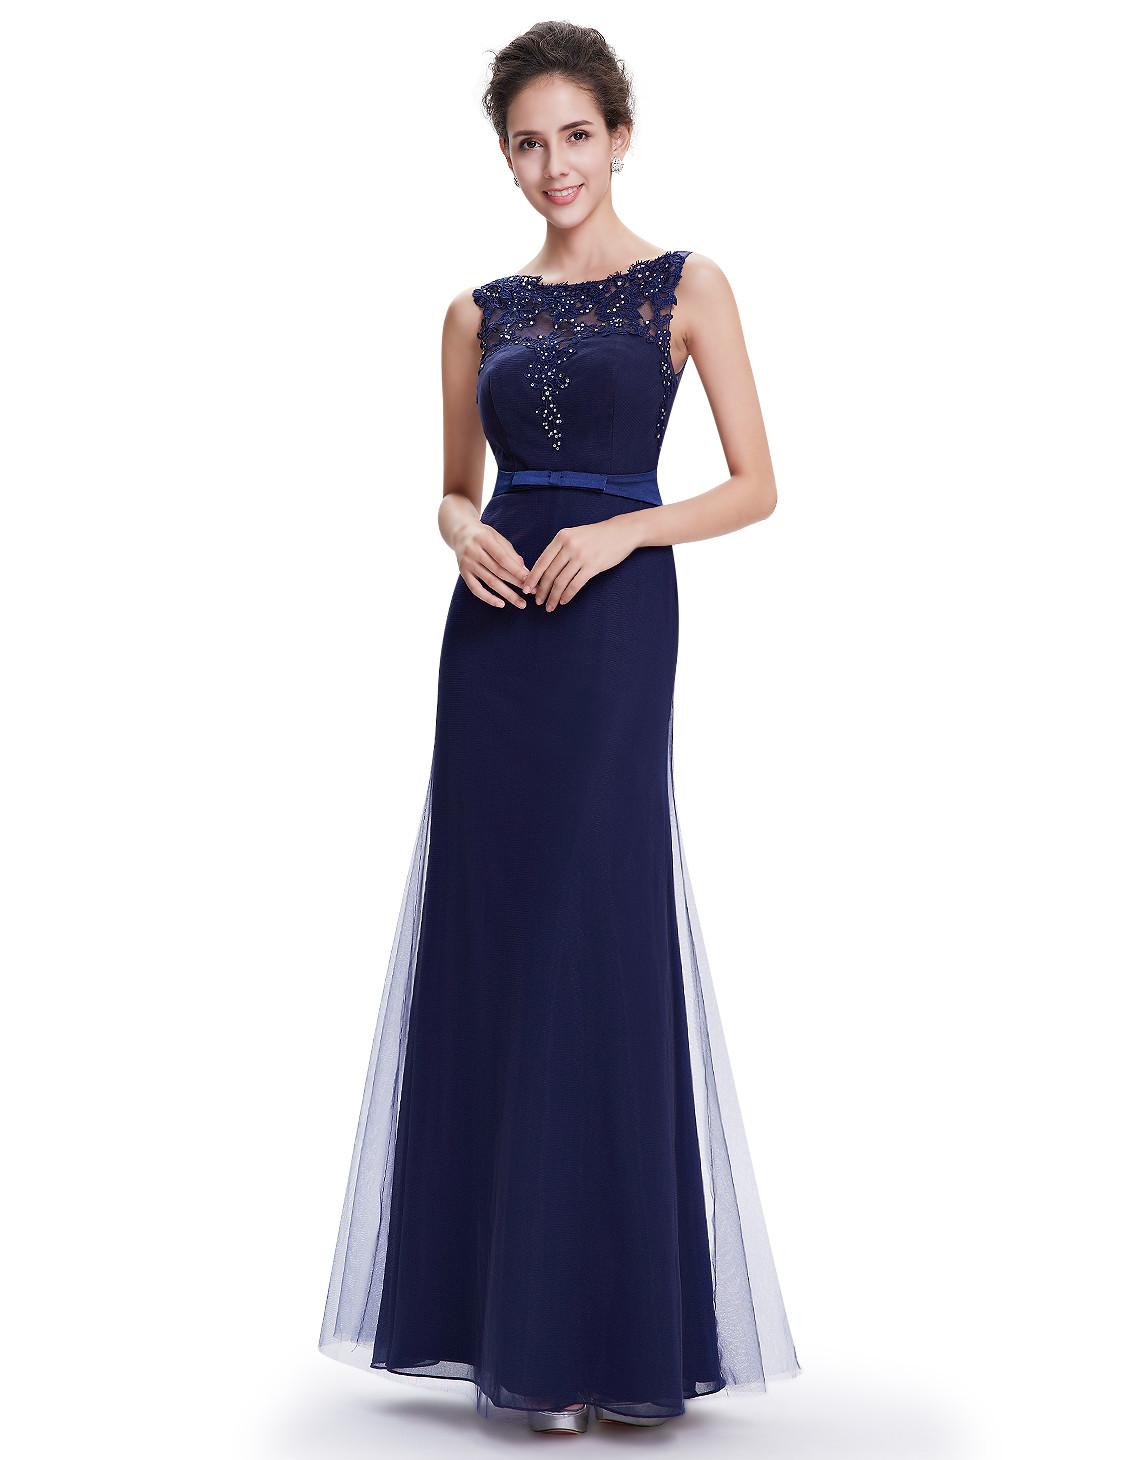 Elegant Long Navy Blue Bridesmaid Dress UK